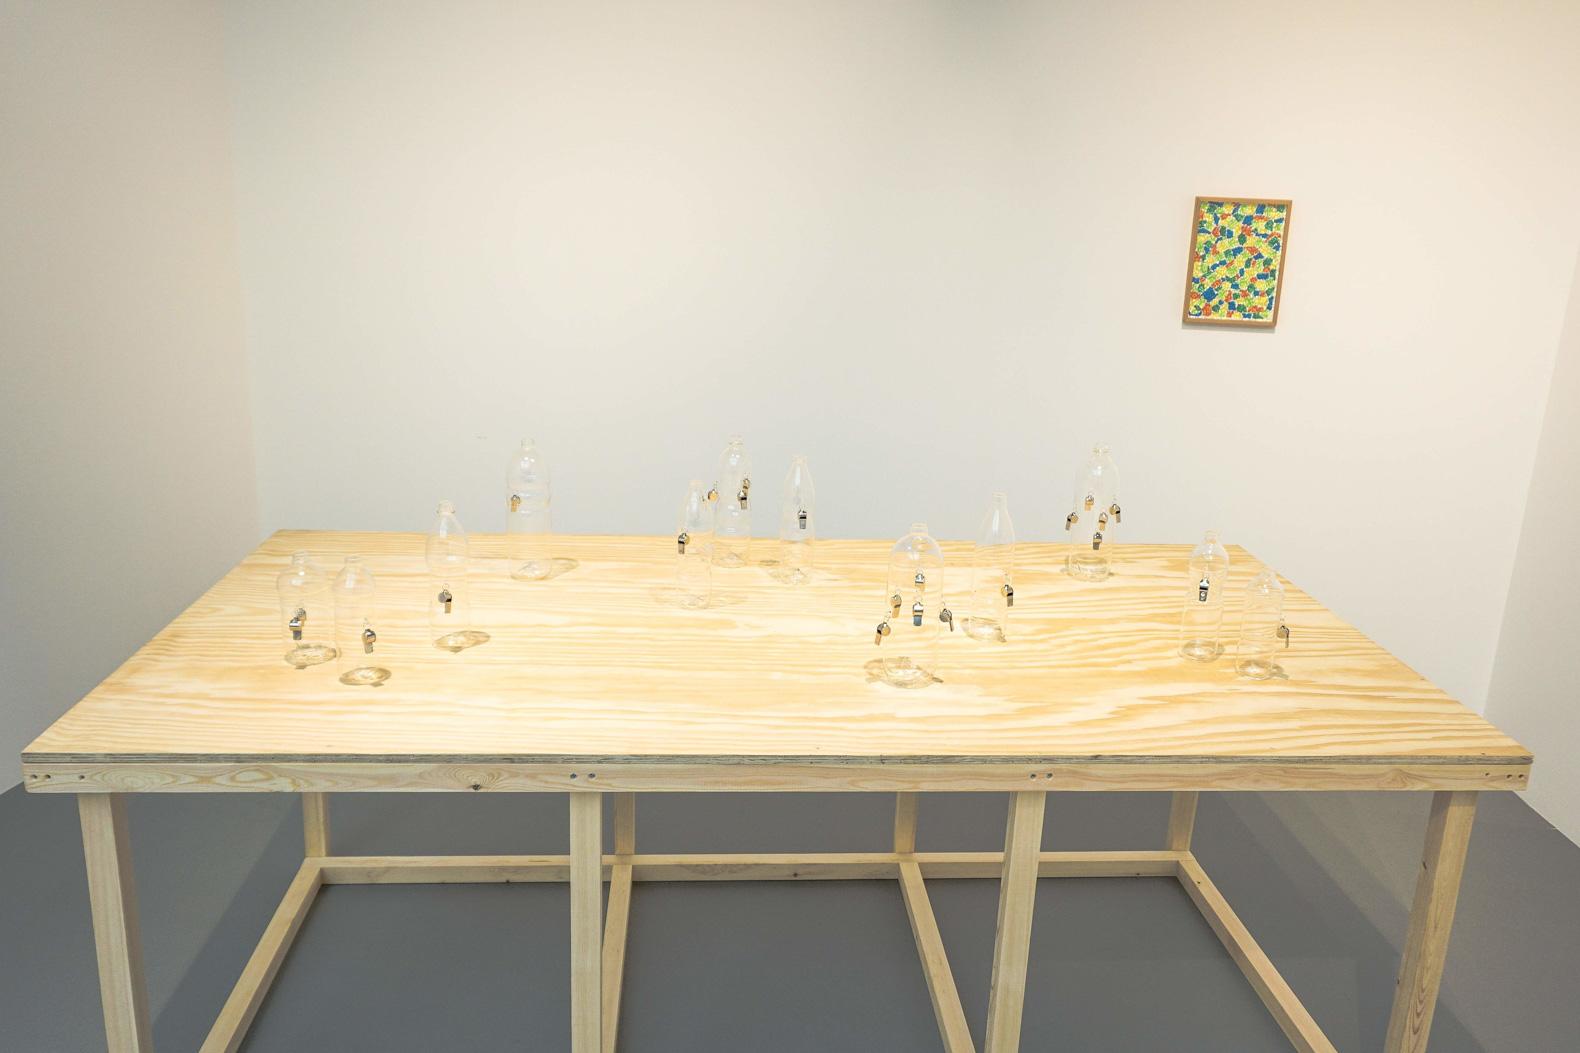 Richard Healy, The Pines, Installation view, ArtInternational Istanbul. Tenderpixel.